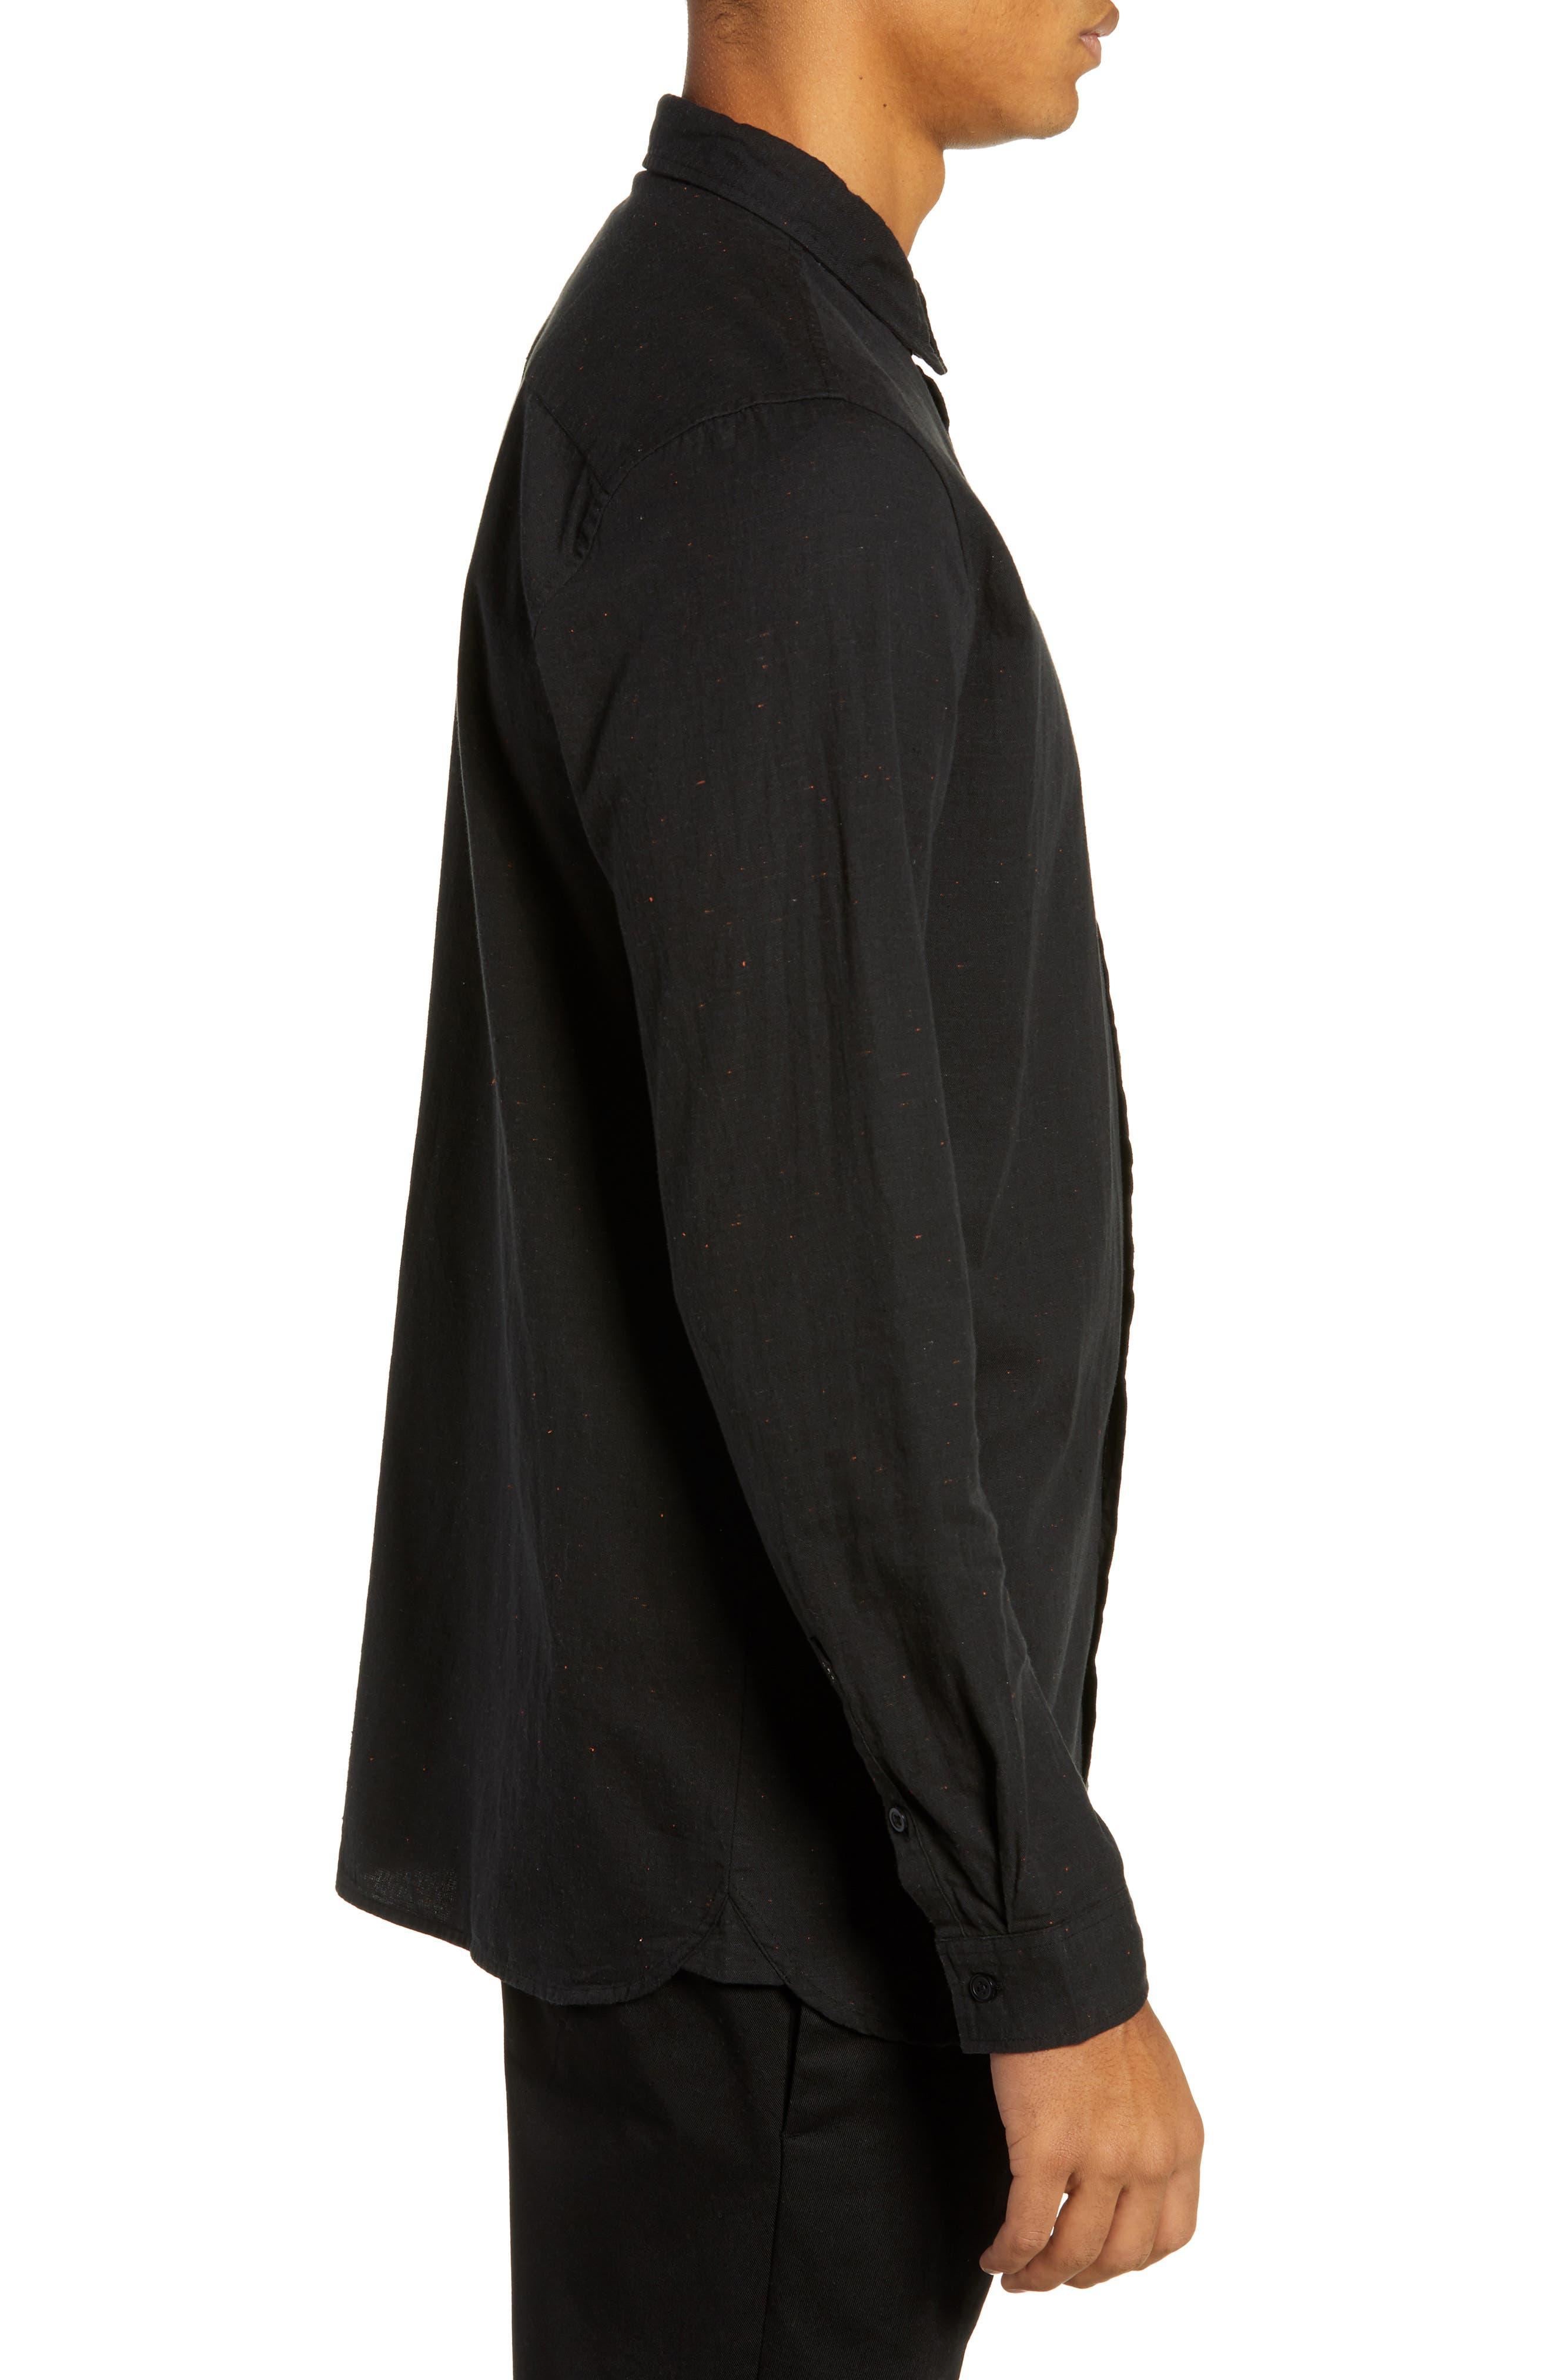 Goodstock Long Sleeve Shirt,                             Alternate thumbnail 3, color,                             LEAD